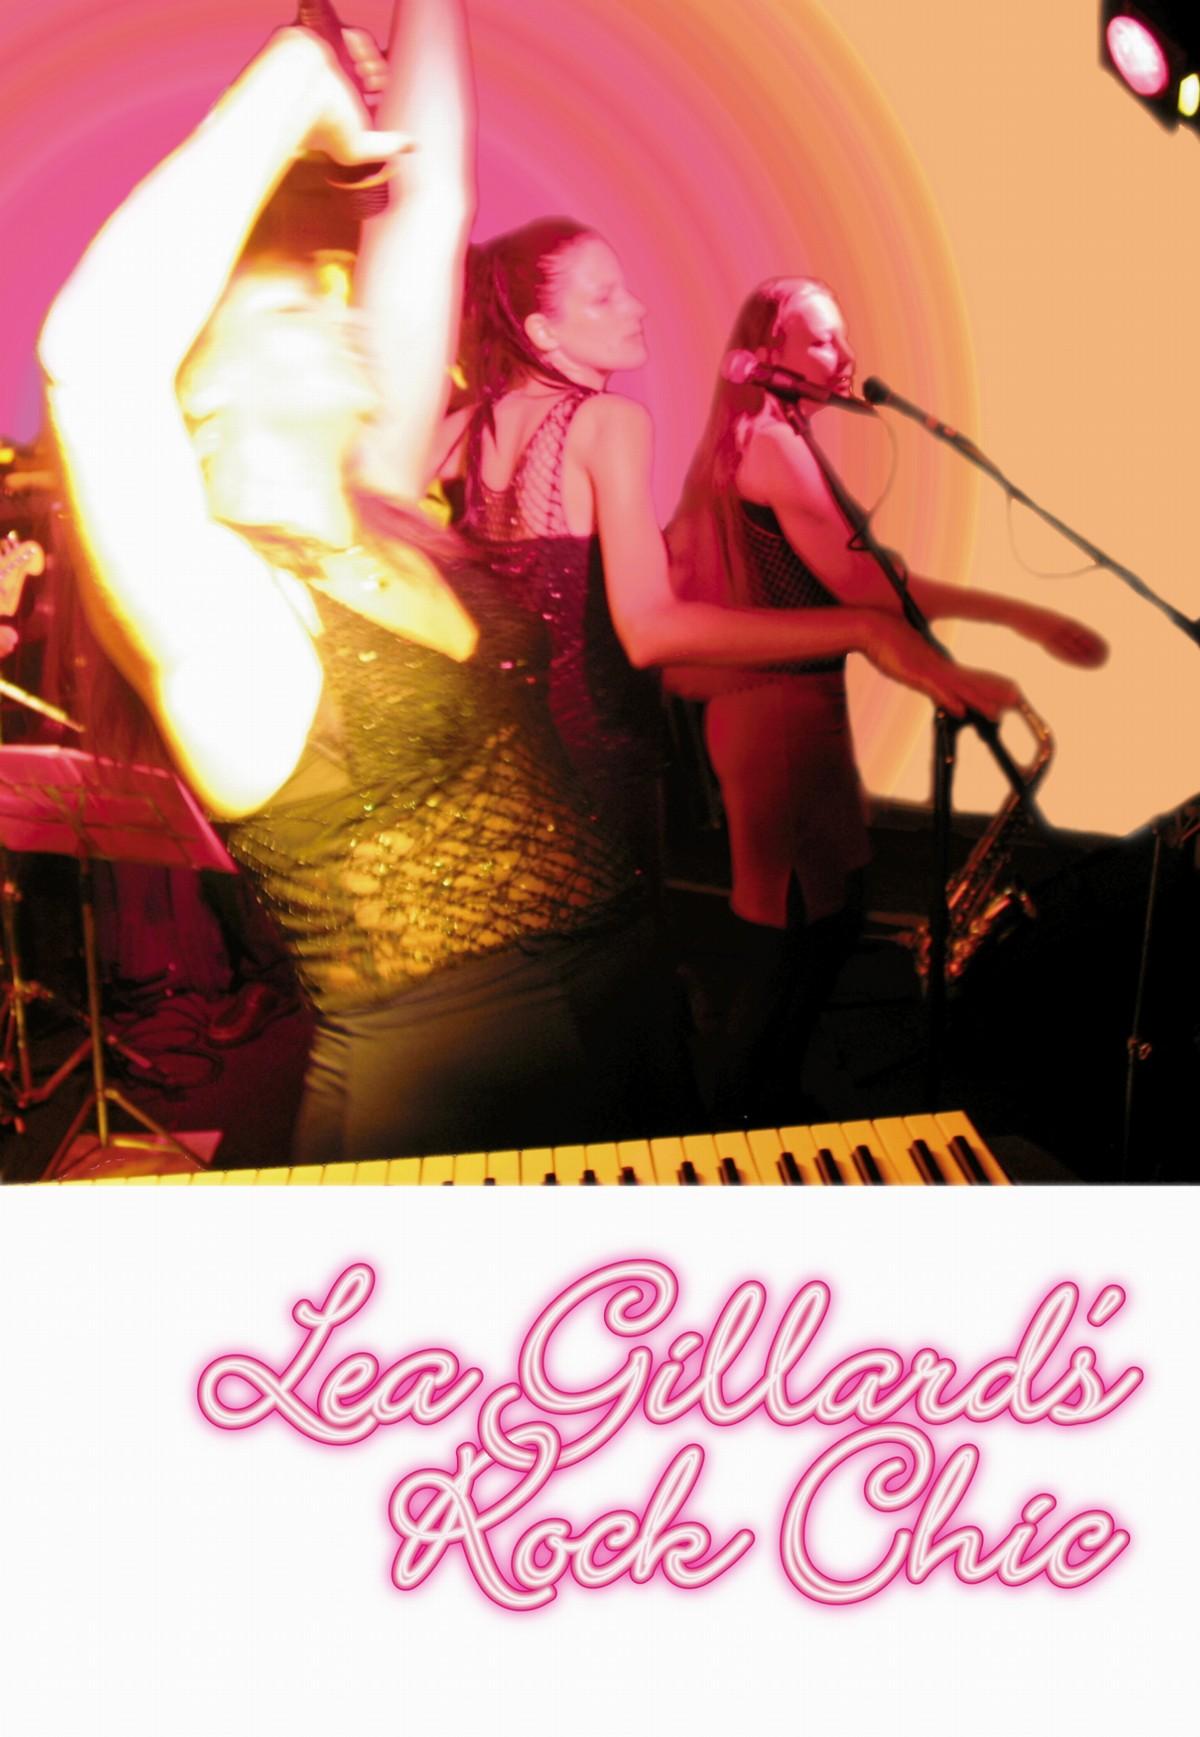 Lea Gillard's Rock Chic - Promo Postcard